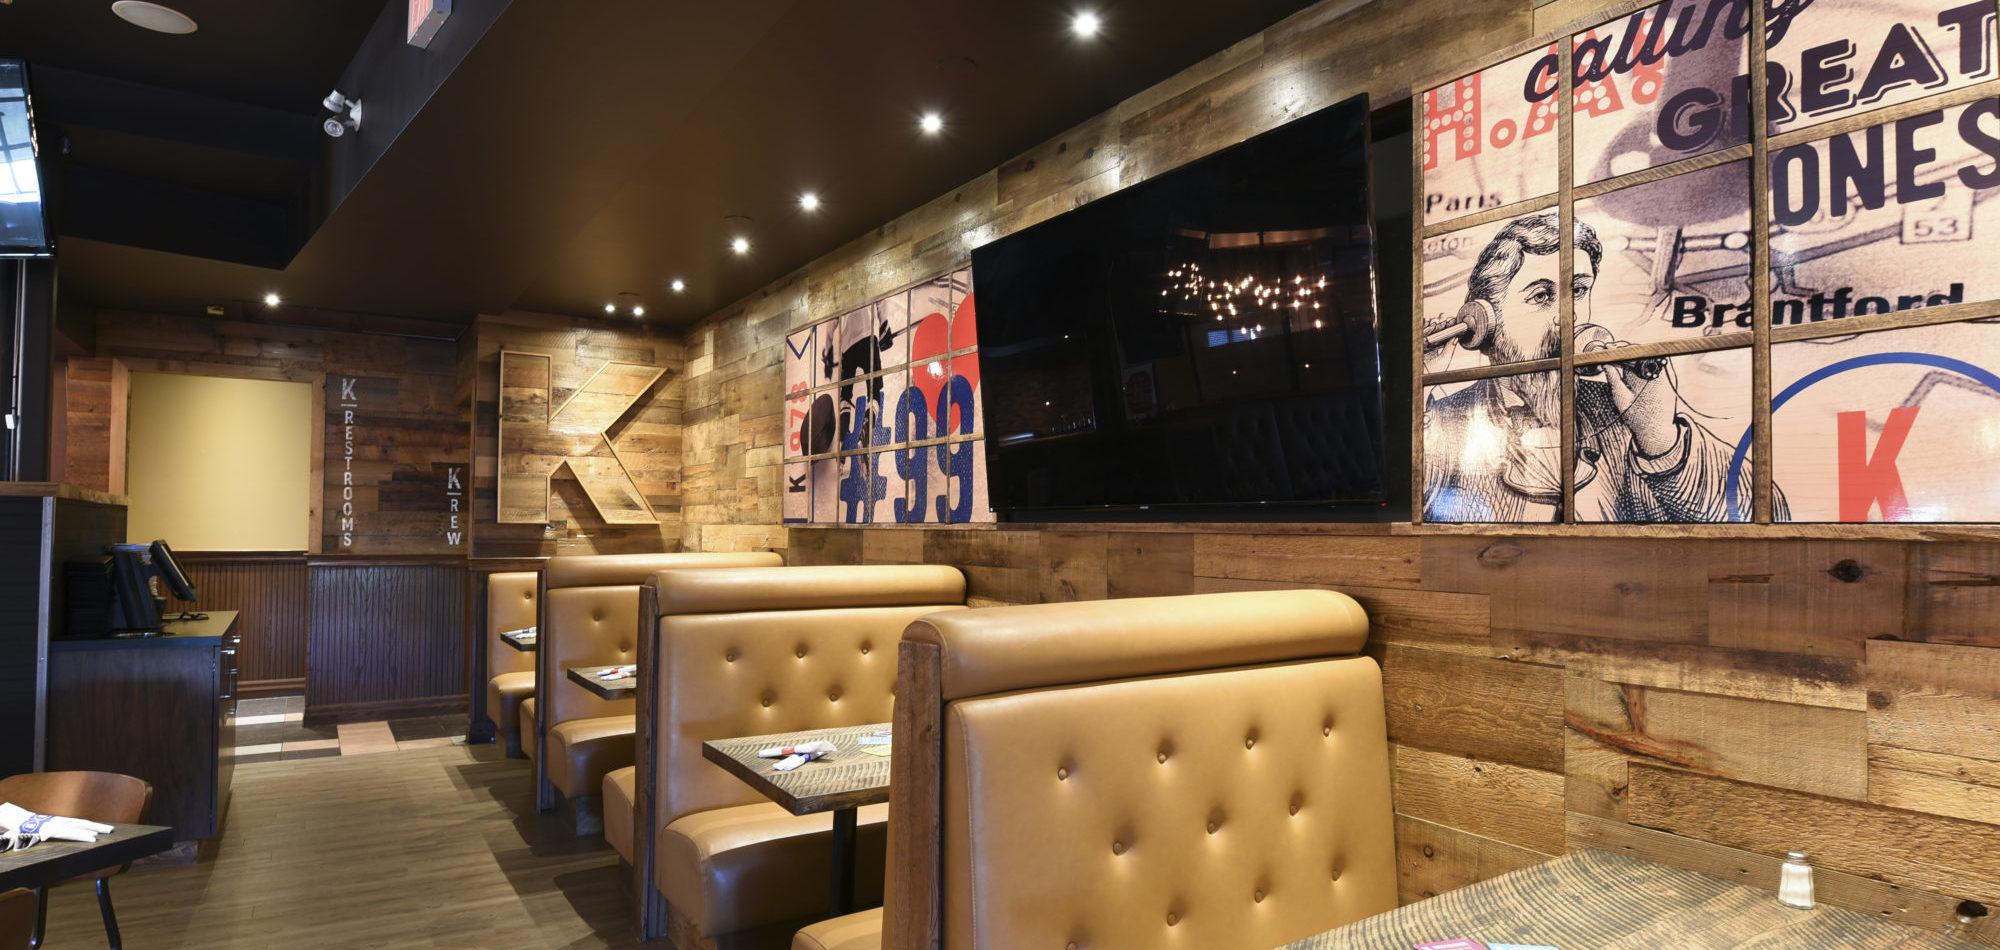 restaurant kitchen design rohl faucet kelsey's original roadhouse - mcmillan